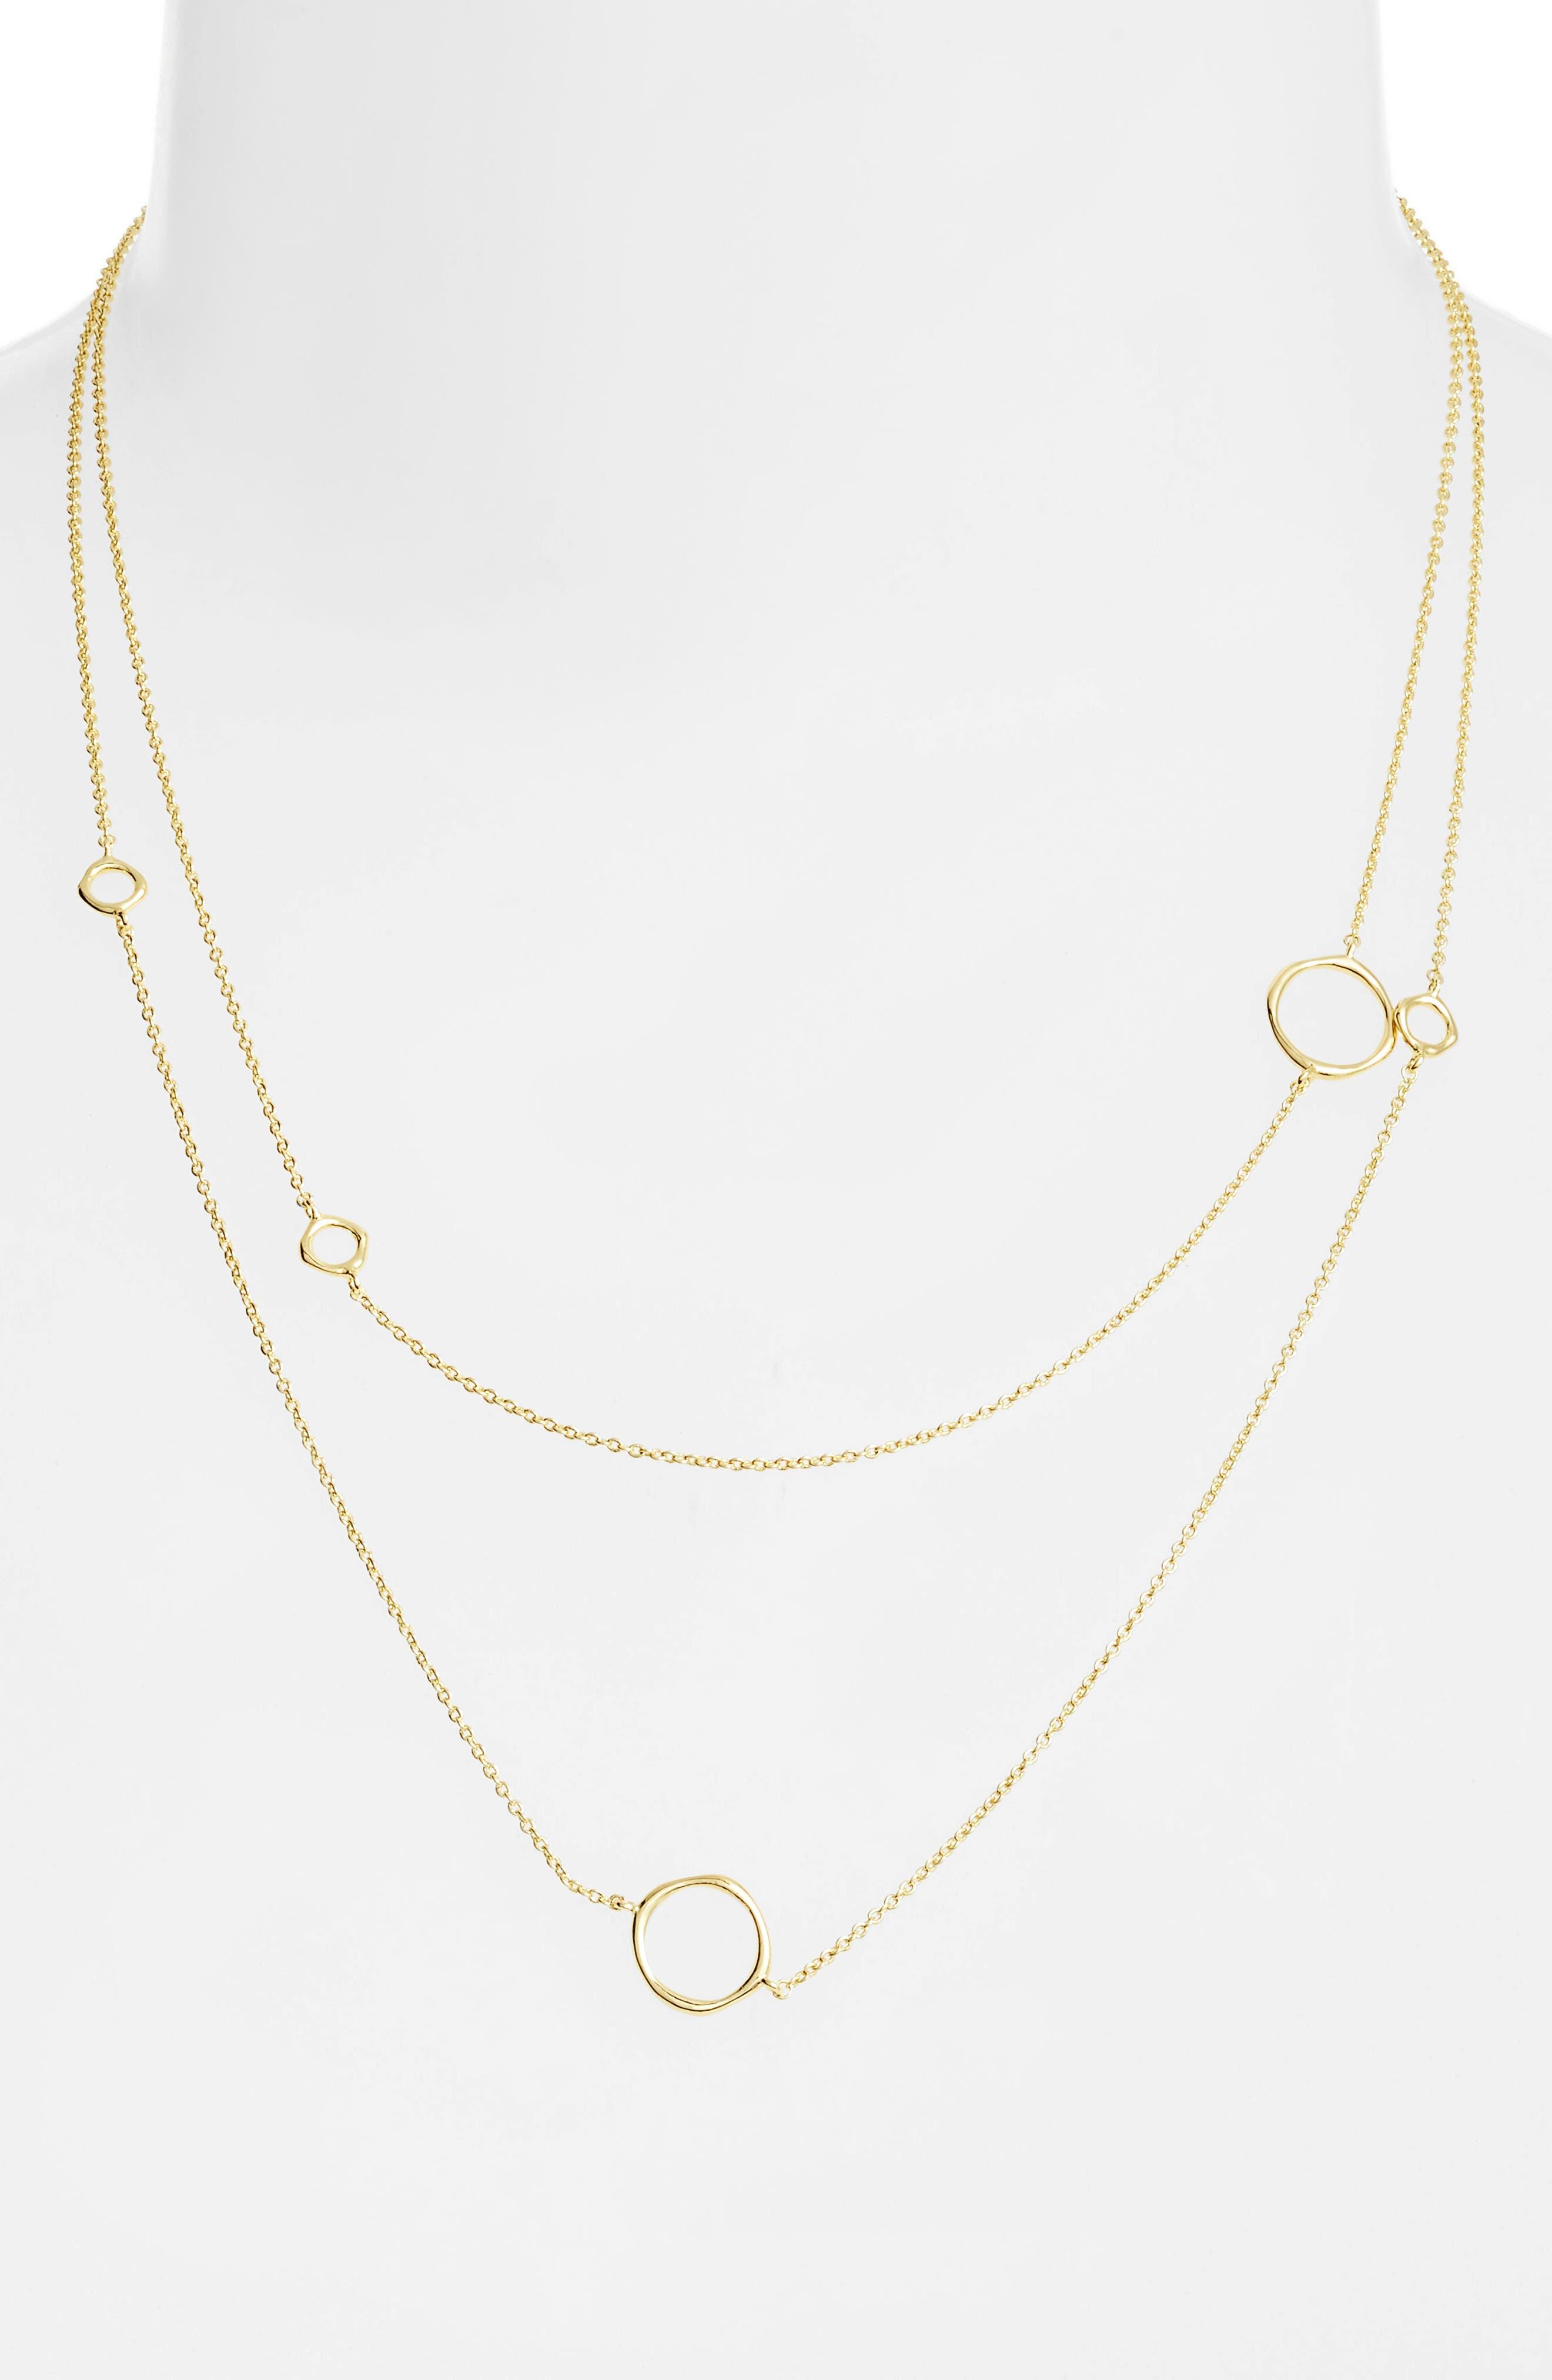 GORJANA, Quinn Wrap Necklace, Alternate thumbnail 2, color, GOLD